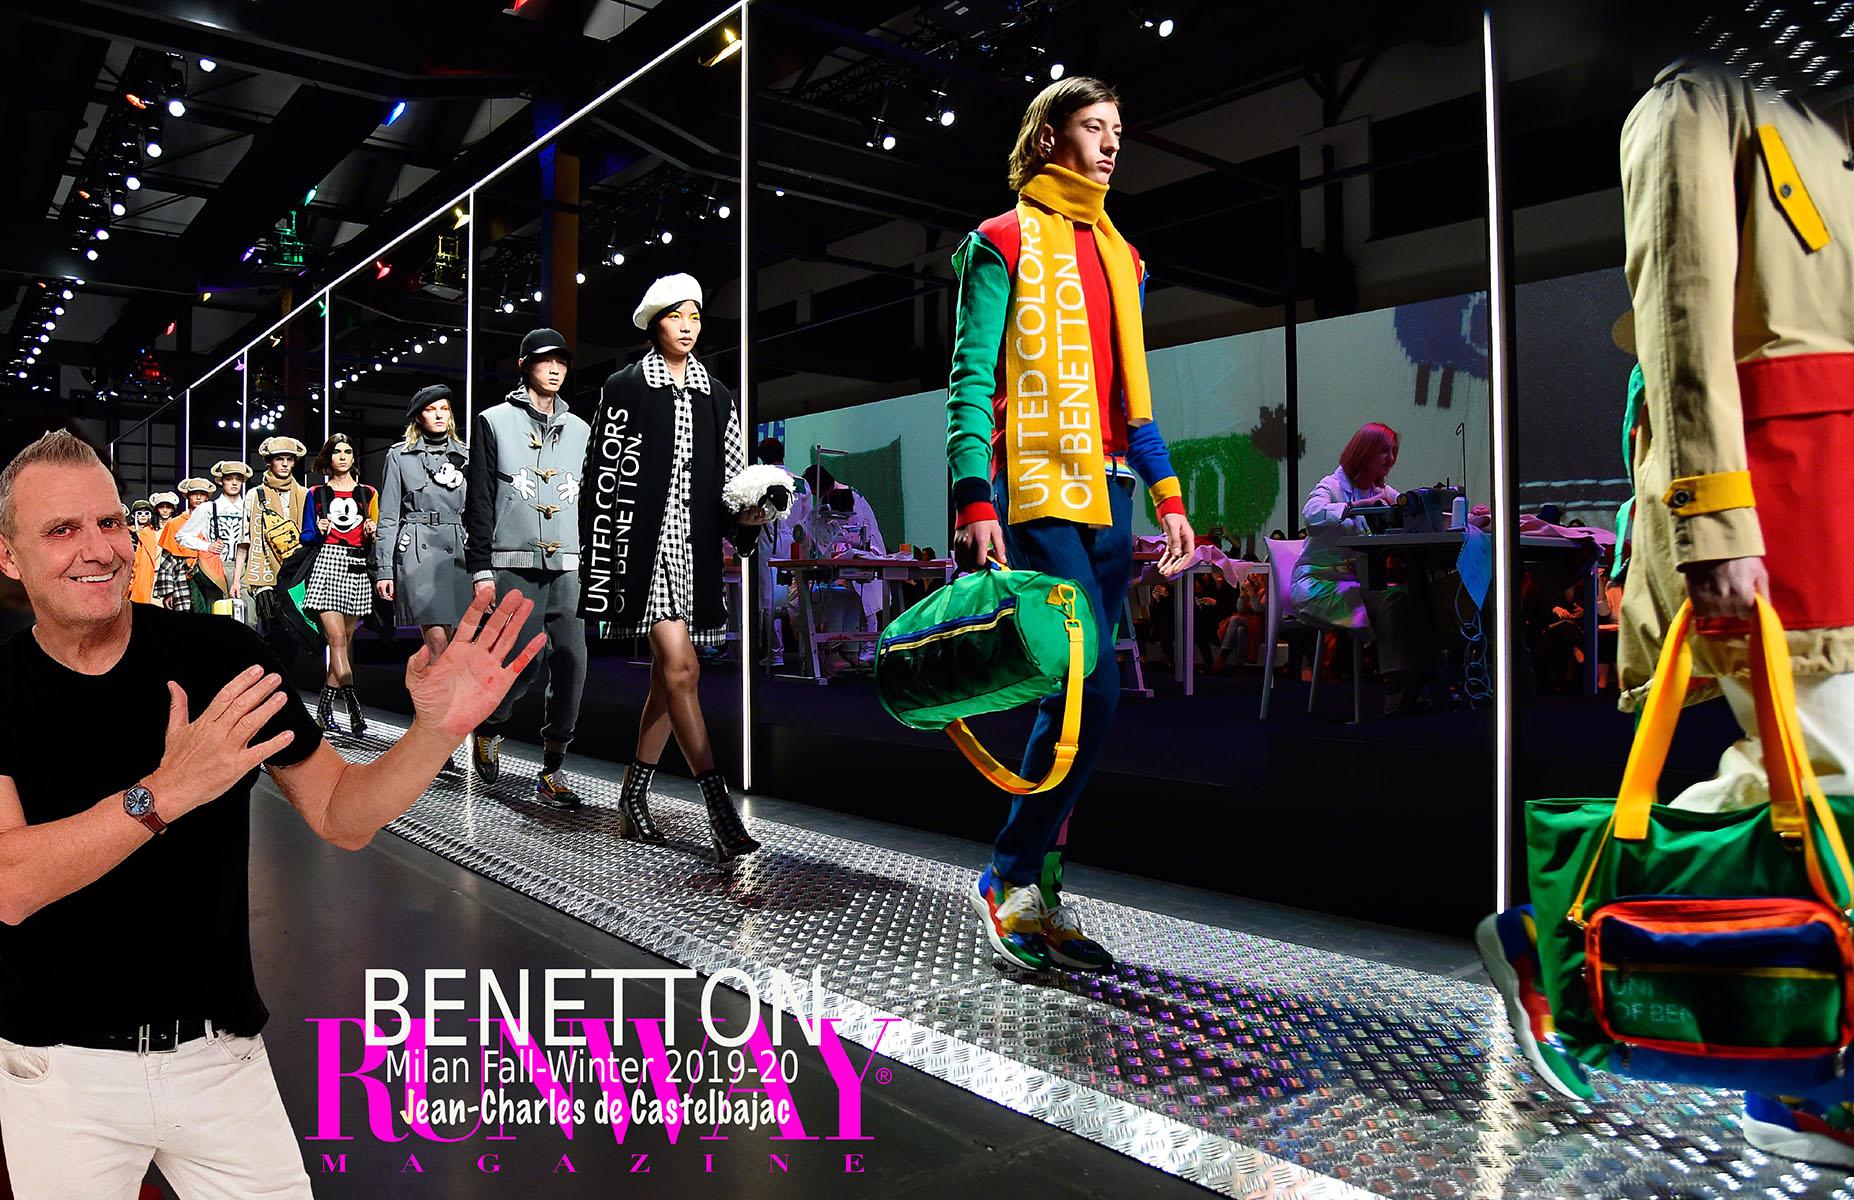 BENETTON JCCastelbajac Milan Fall-Winter 2019-2020 by Runway Magazine